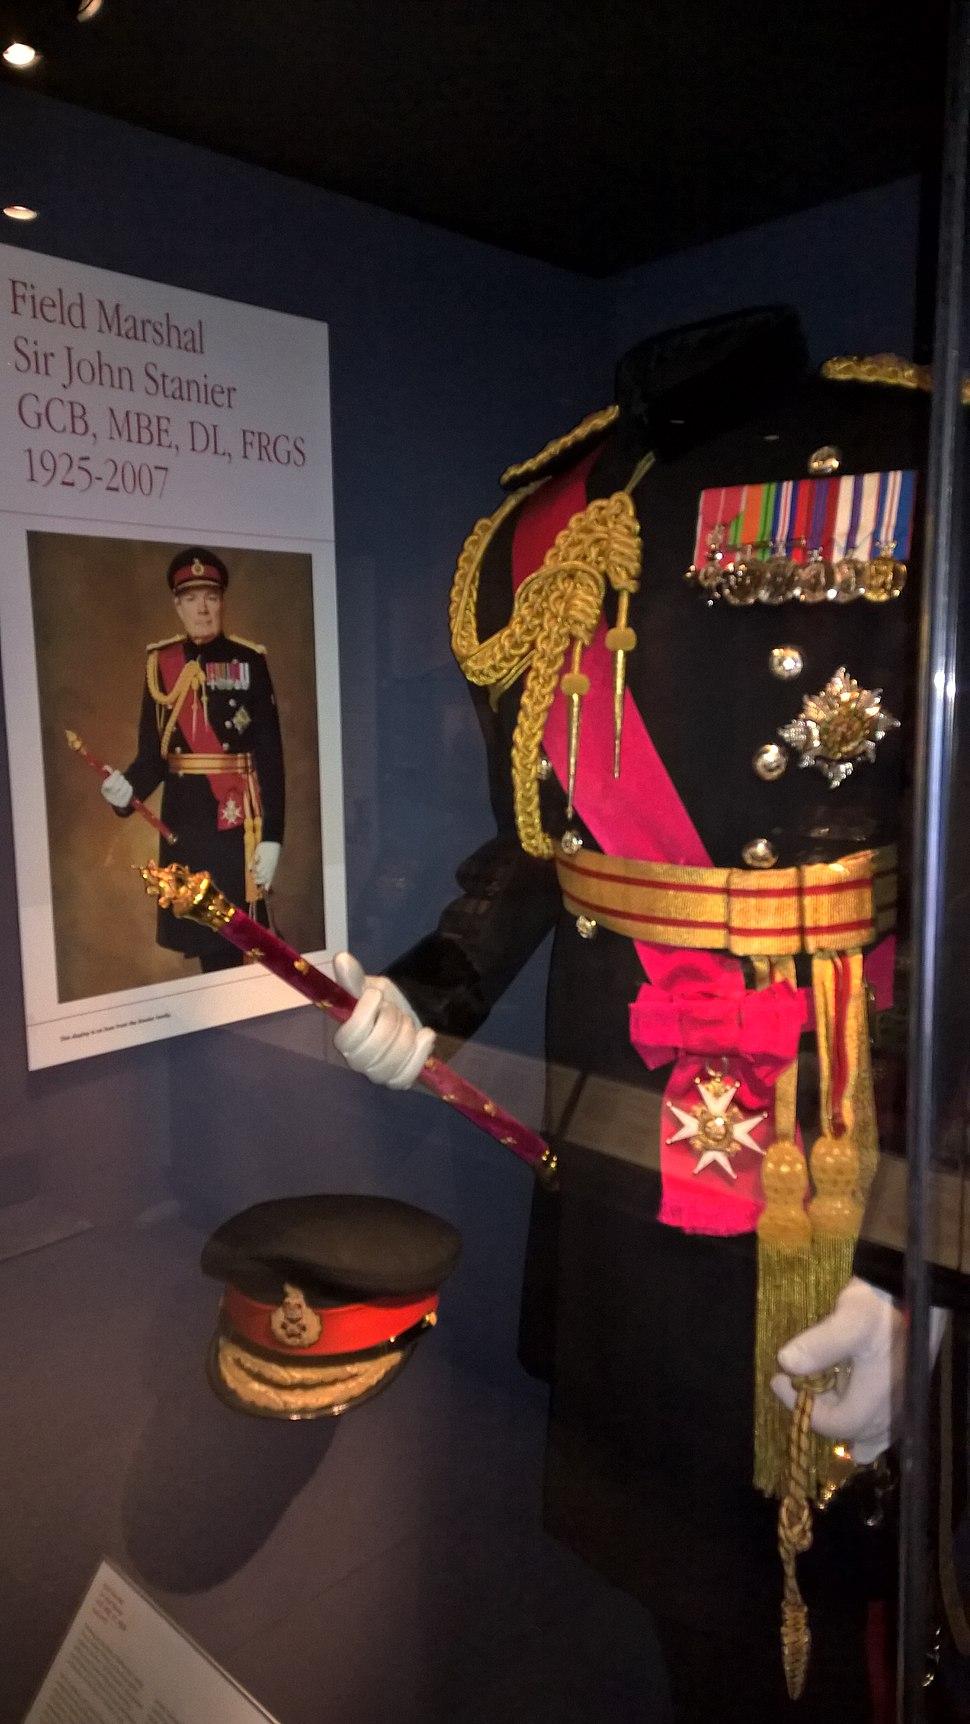 Field Marshal's uniform and baton